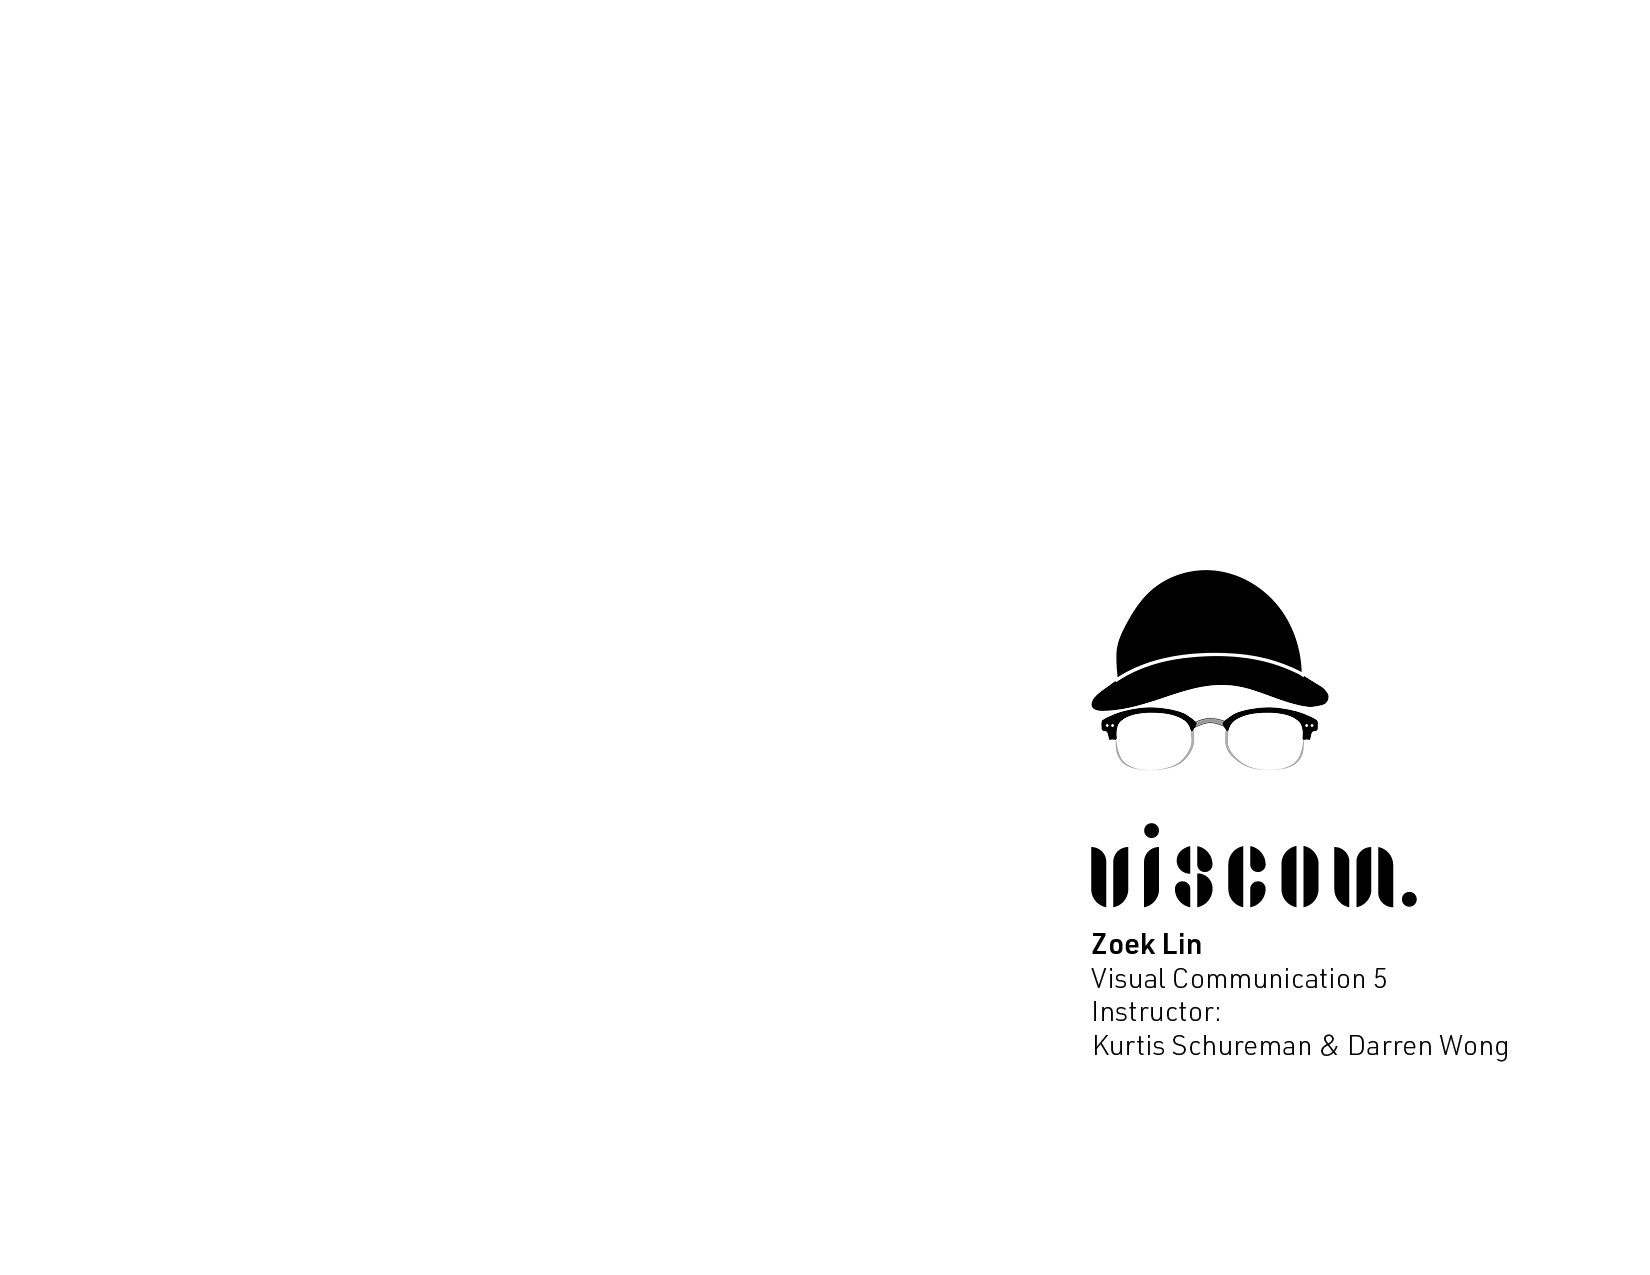 Viscom5 booklist.jpg